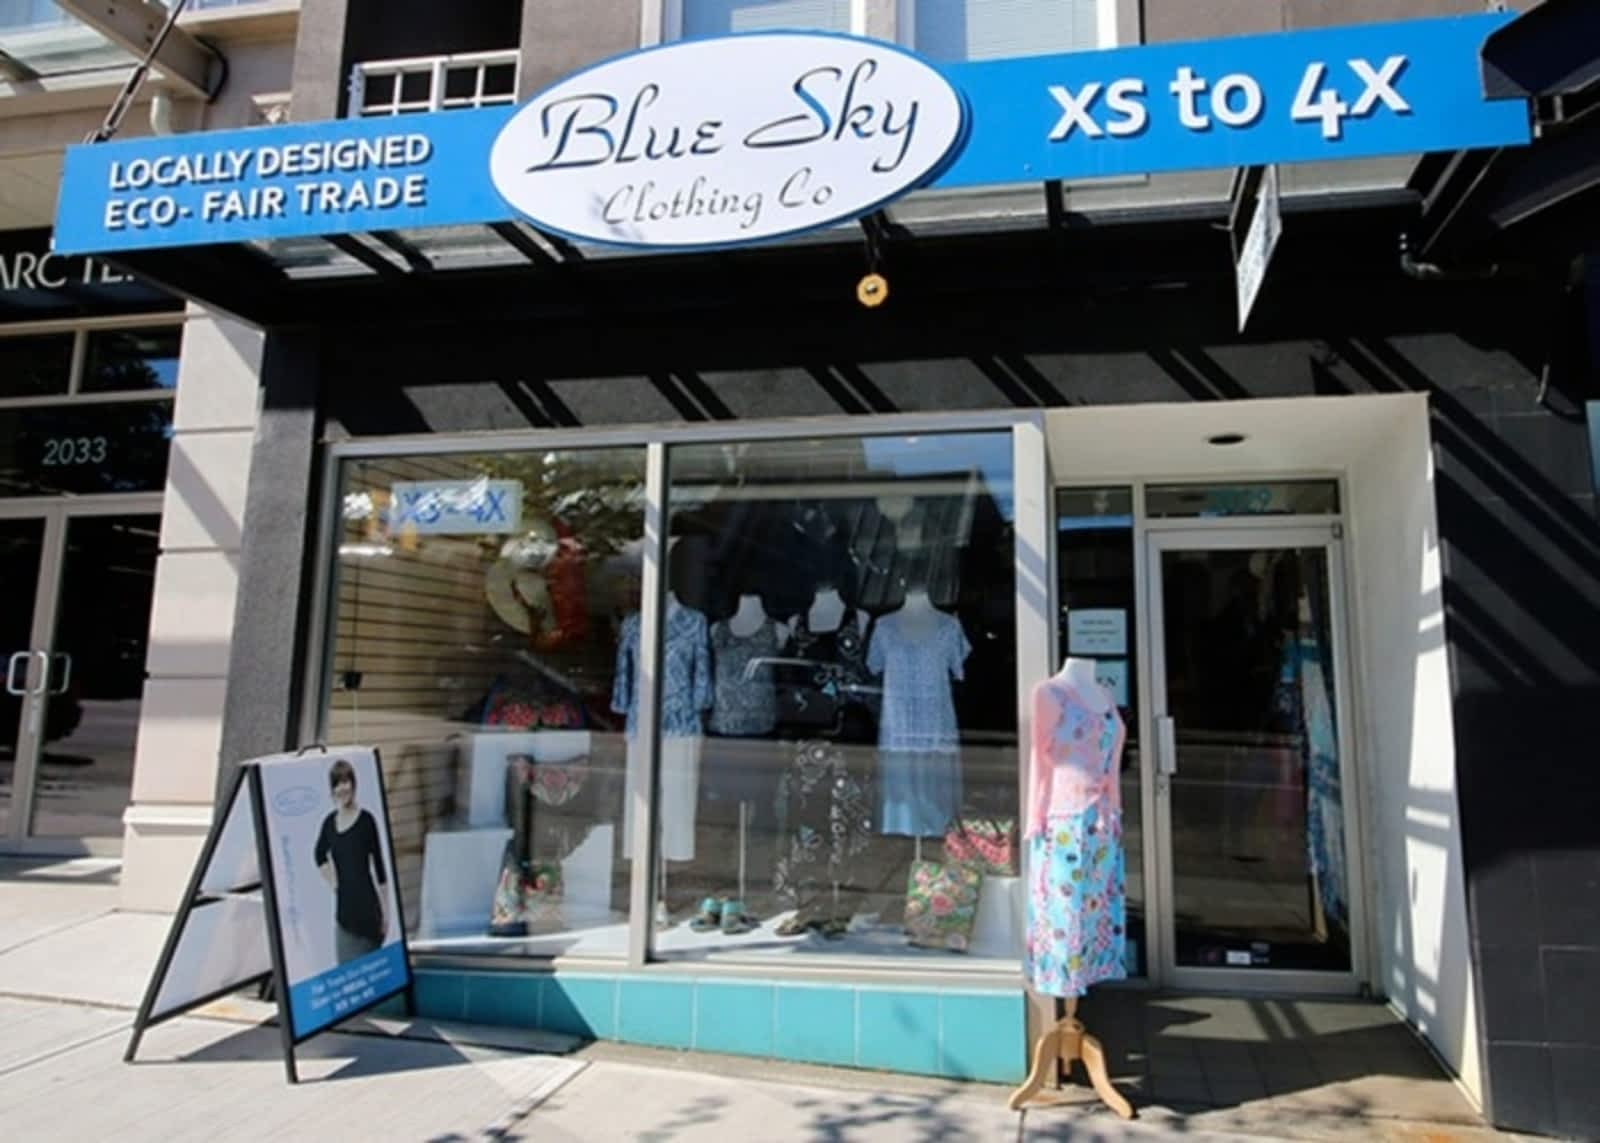 Blue Sky Clothing Co